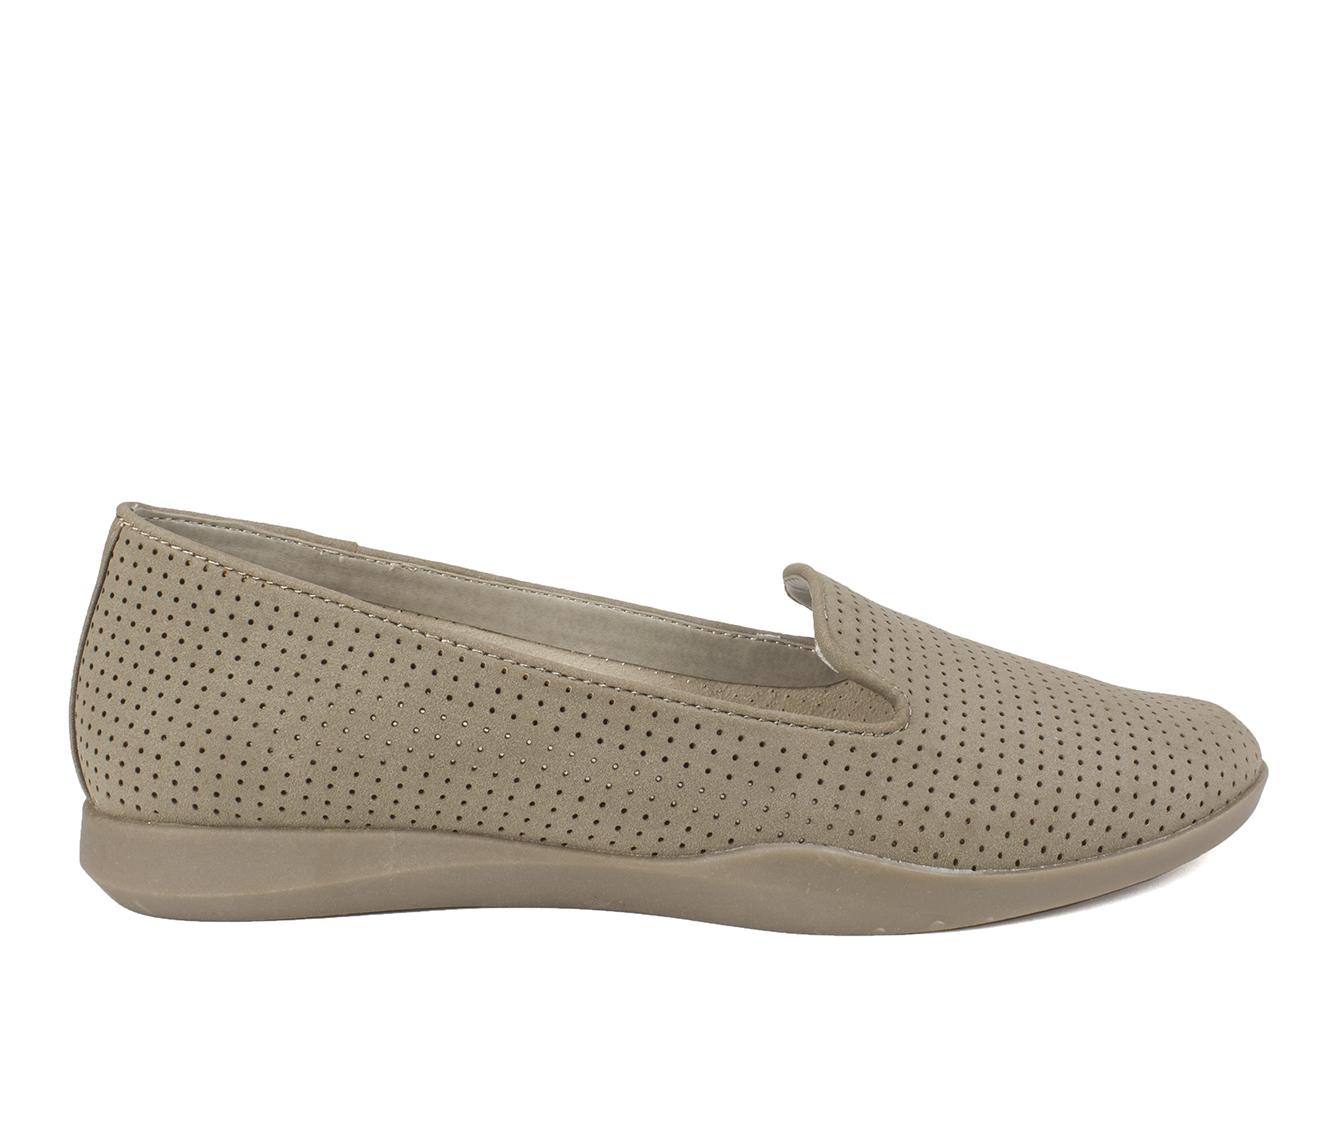 Cliffs Piper Women's Shoe (Brown Faux Leather)